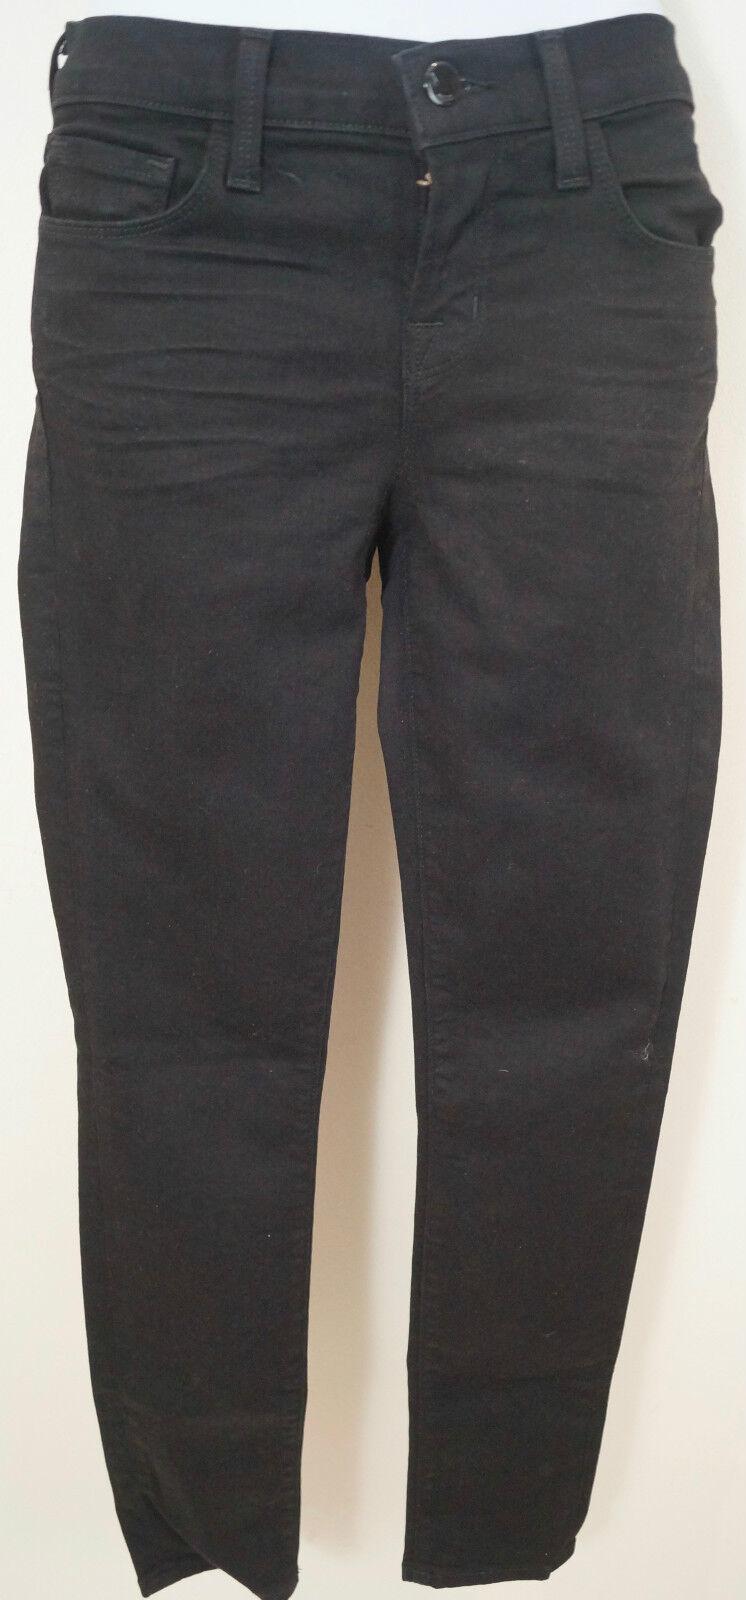 J Brand Brand Brand da donna nero Thunderhead Misto Cotone Pantaloni Pants Jeans Sz24 IL27.5  a428ee